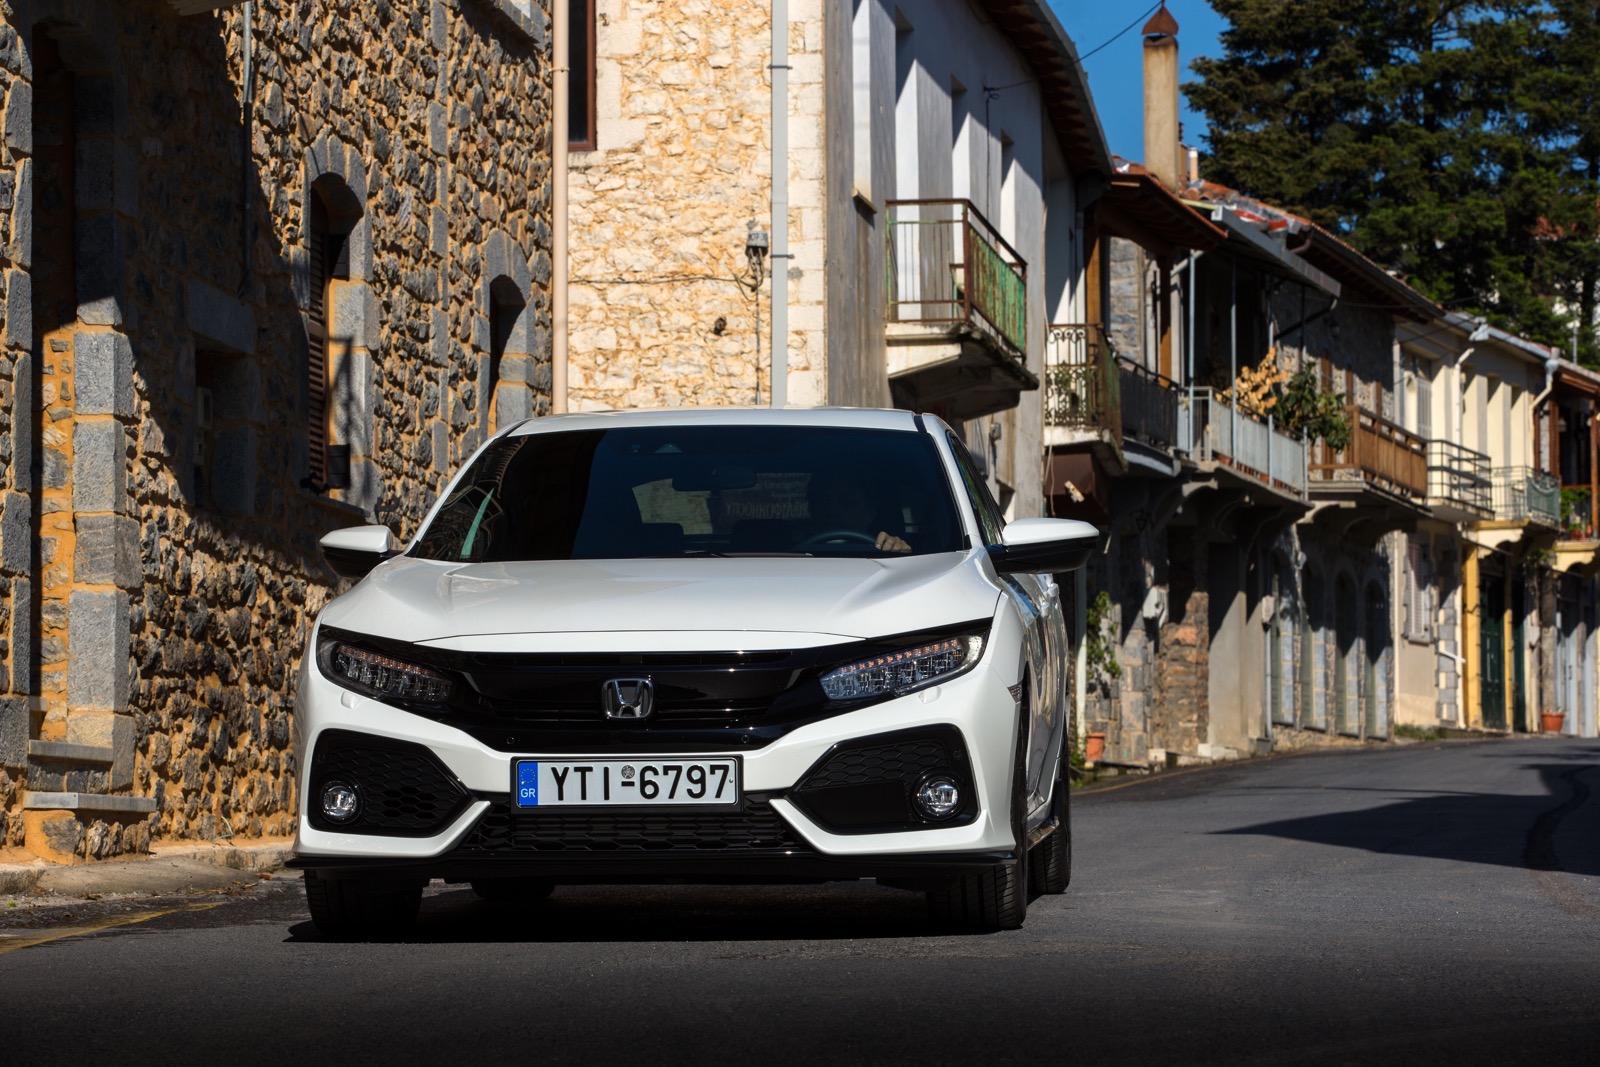 New_Honda_Civic_First_Drive_25